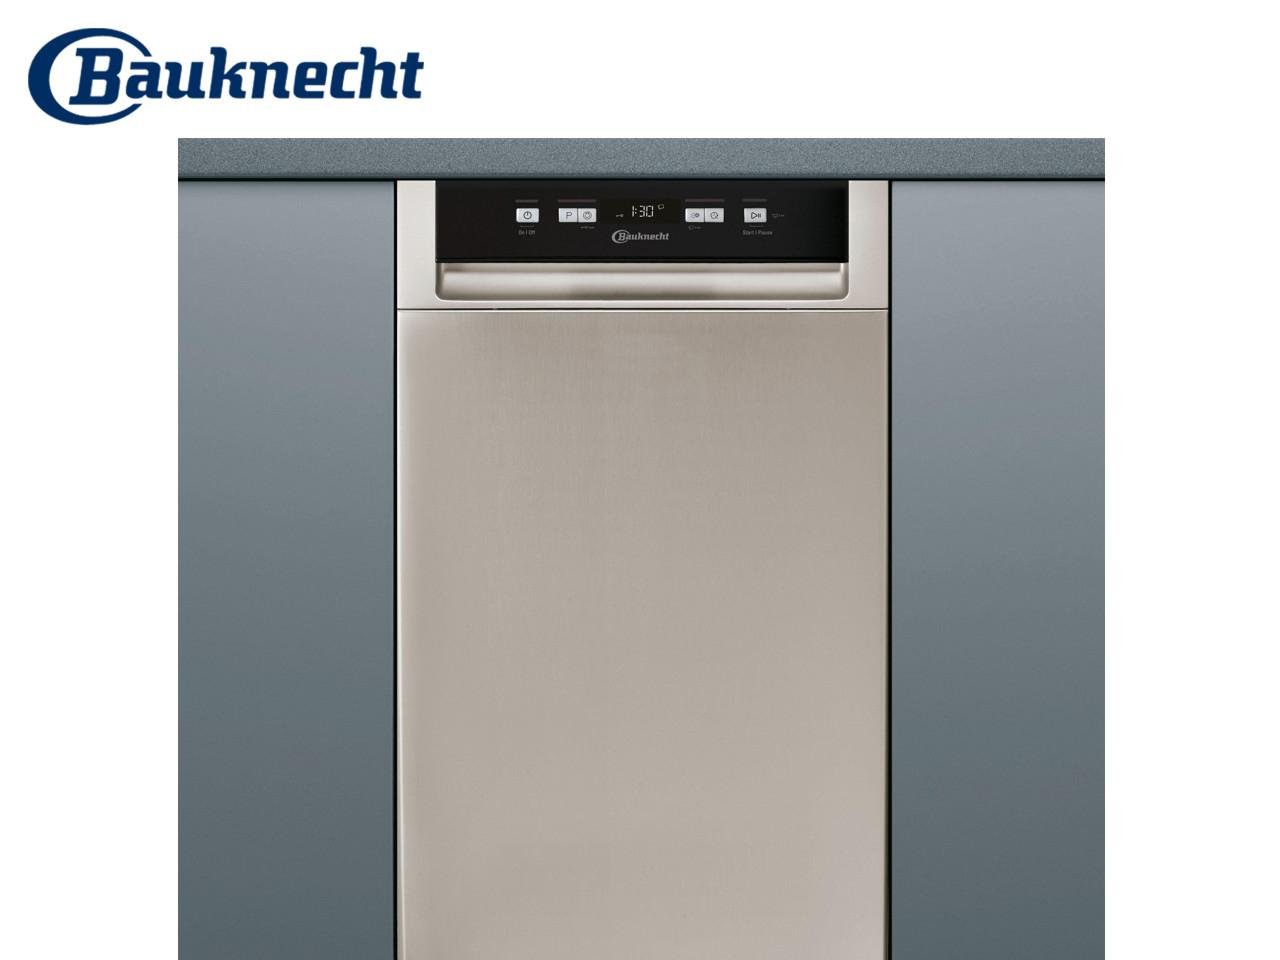 BAUKNECHT OBU Ecostar 8445